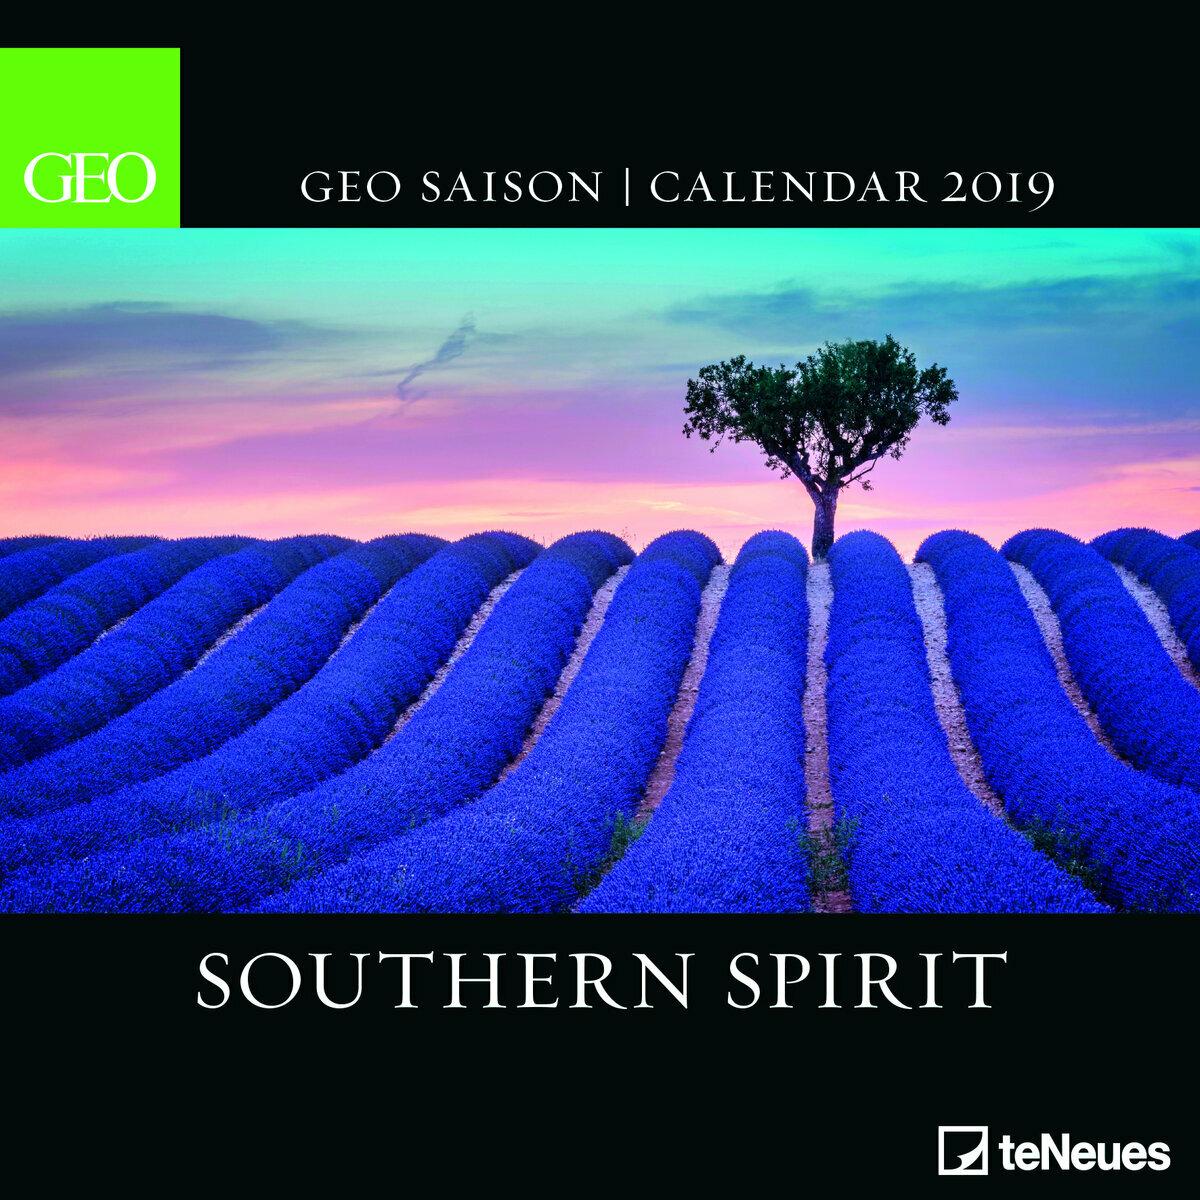 Calendrier Geo 2019.Calendrier 2019 Geo Esprit Du Sud